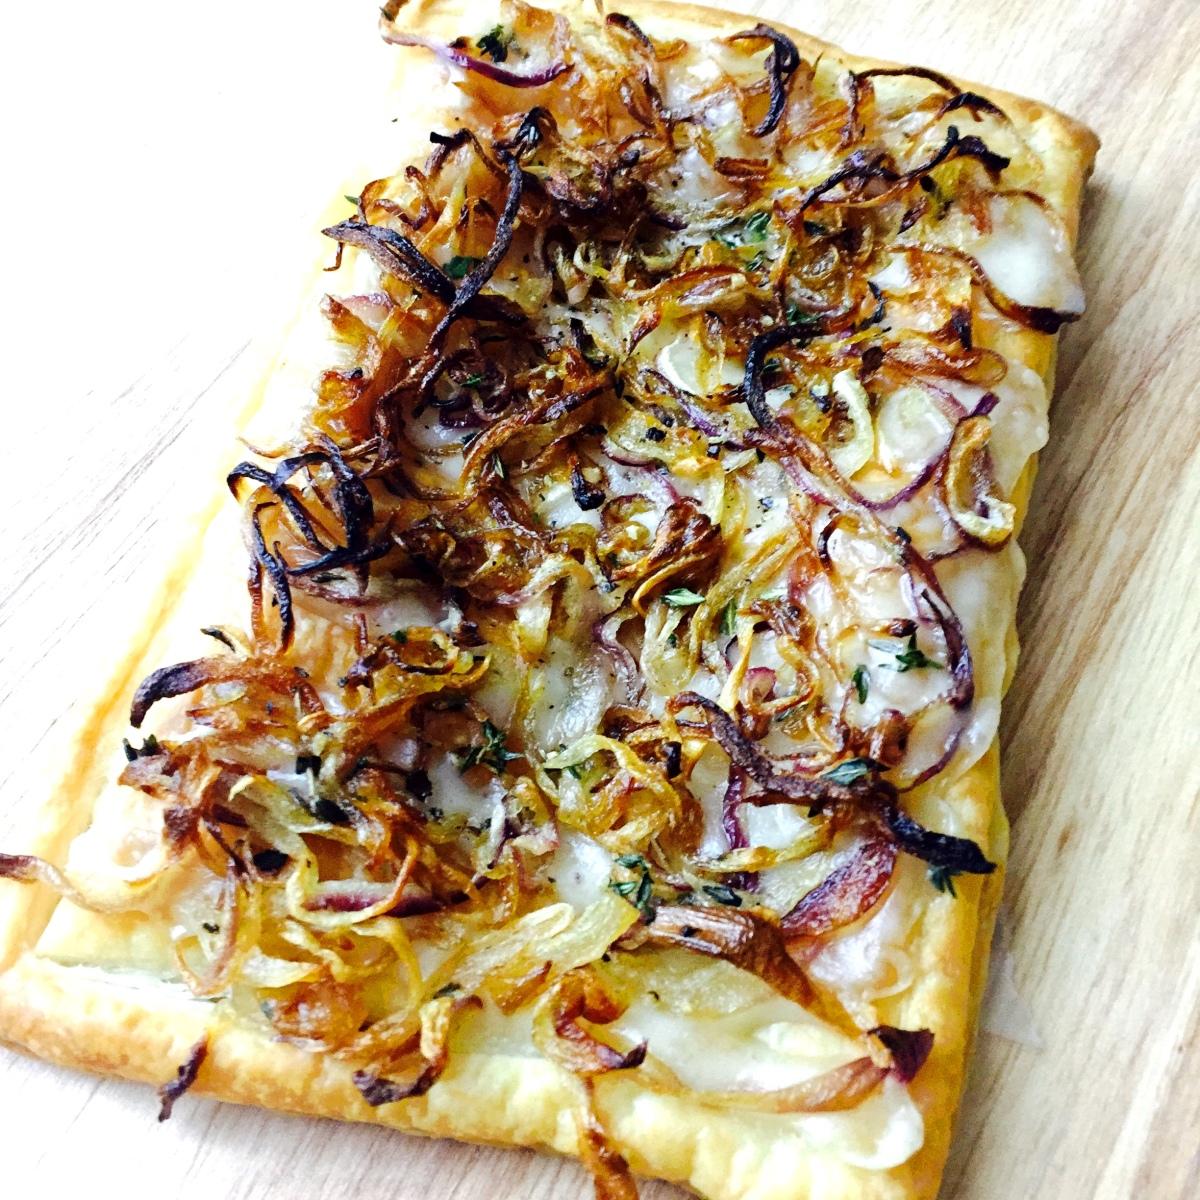 ... onion tart savory caramelized onion mushroom and thyme tart onion tart